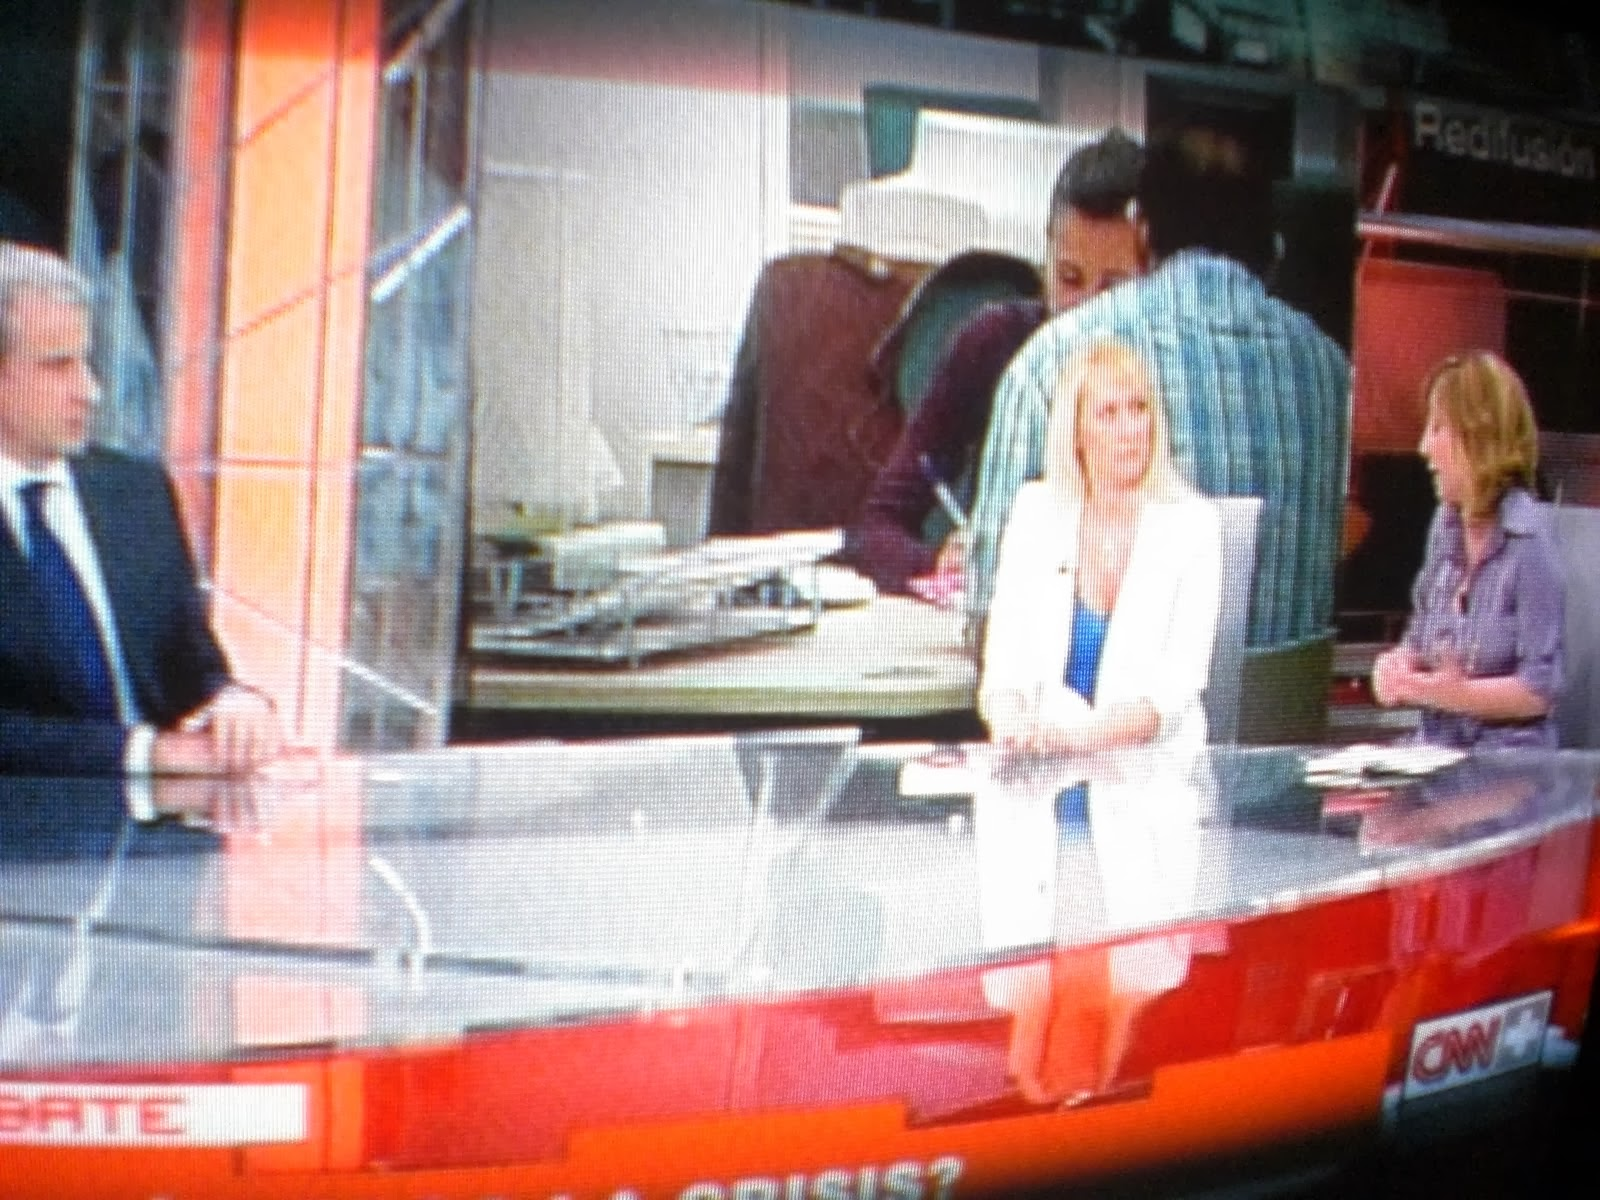 El Debate - CNN+: Jose Mª Calleja